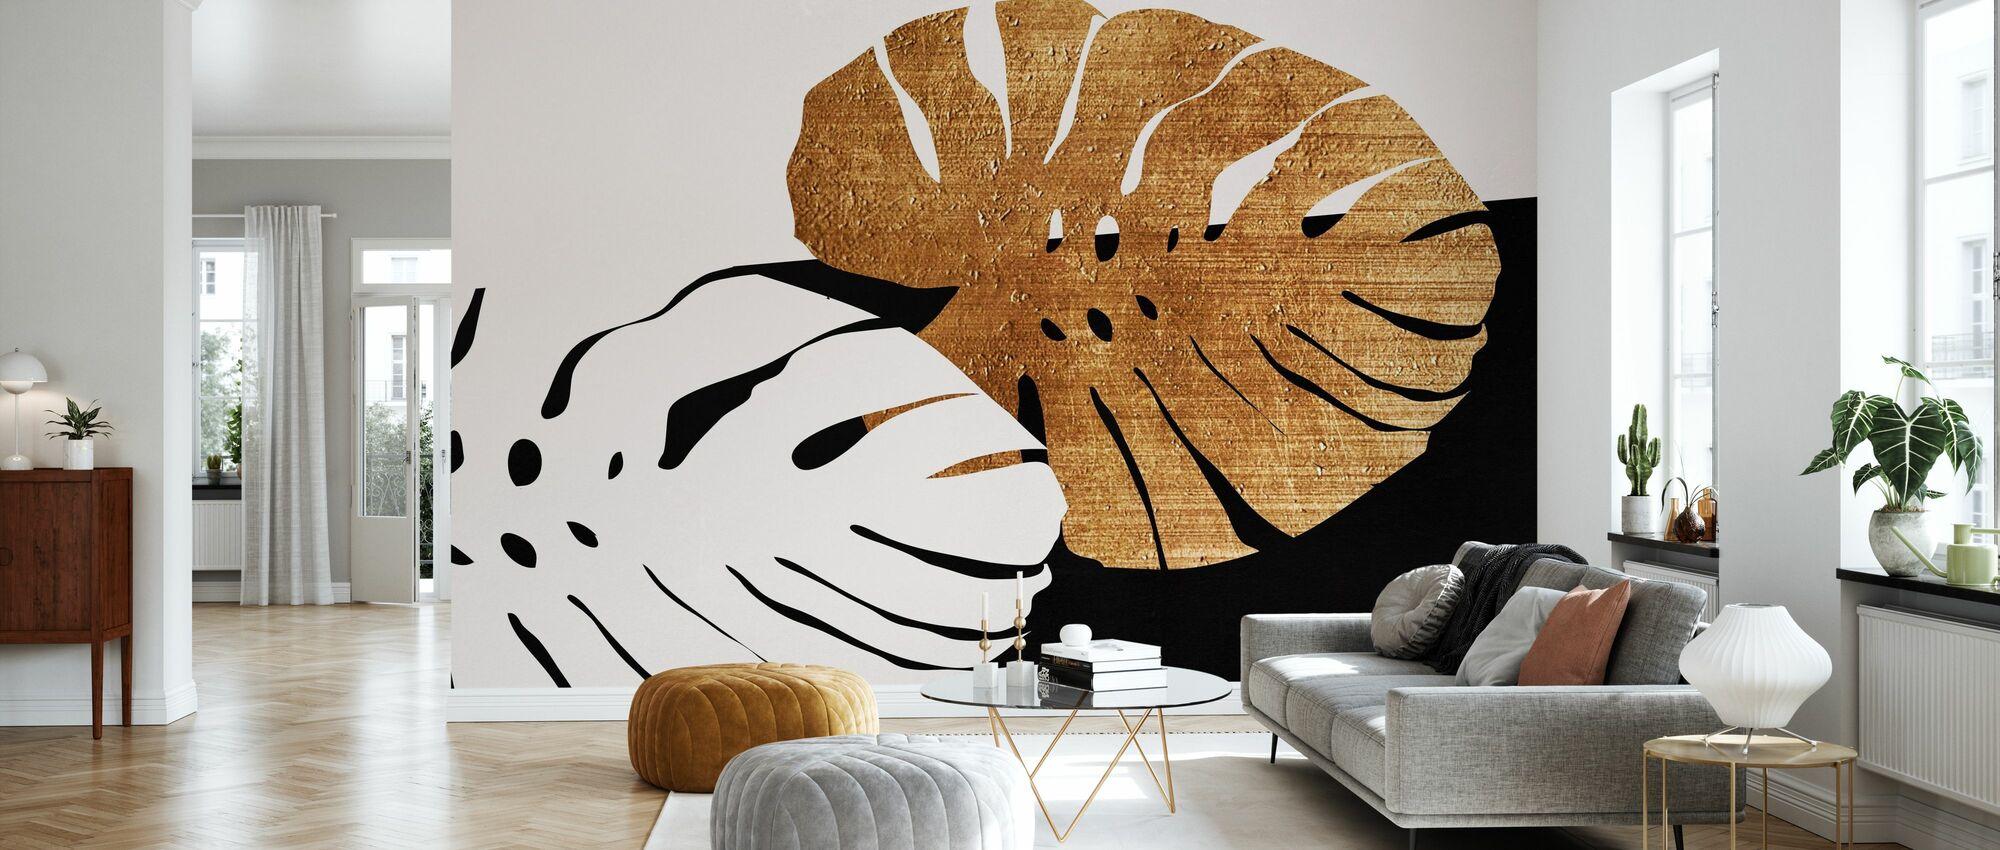 Monstera Leafs - Wallpaper - Living Room